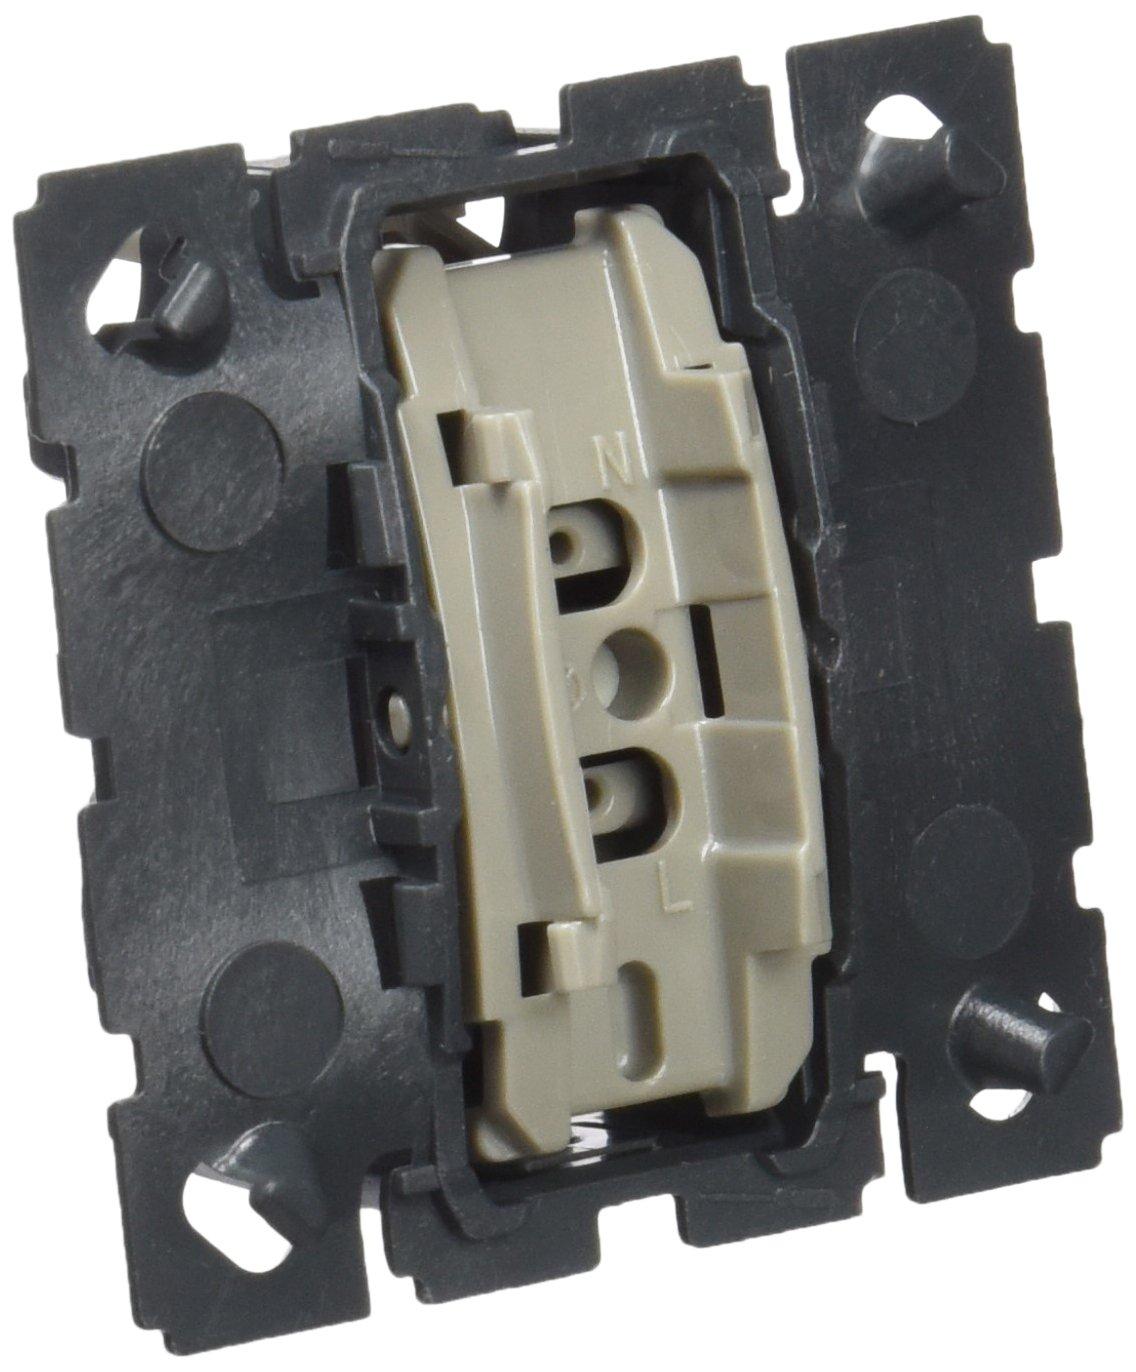 Legrand LEG67001 - Céline - switch (10 x, 230 v, 2 velocità)